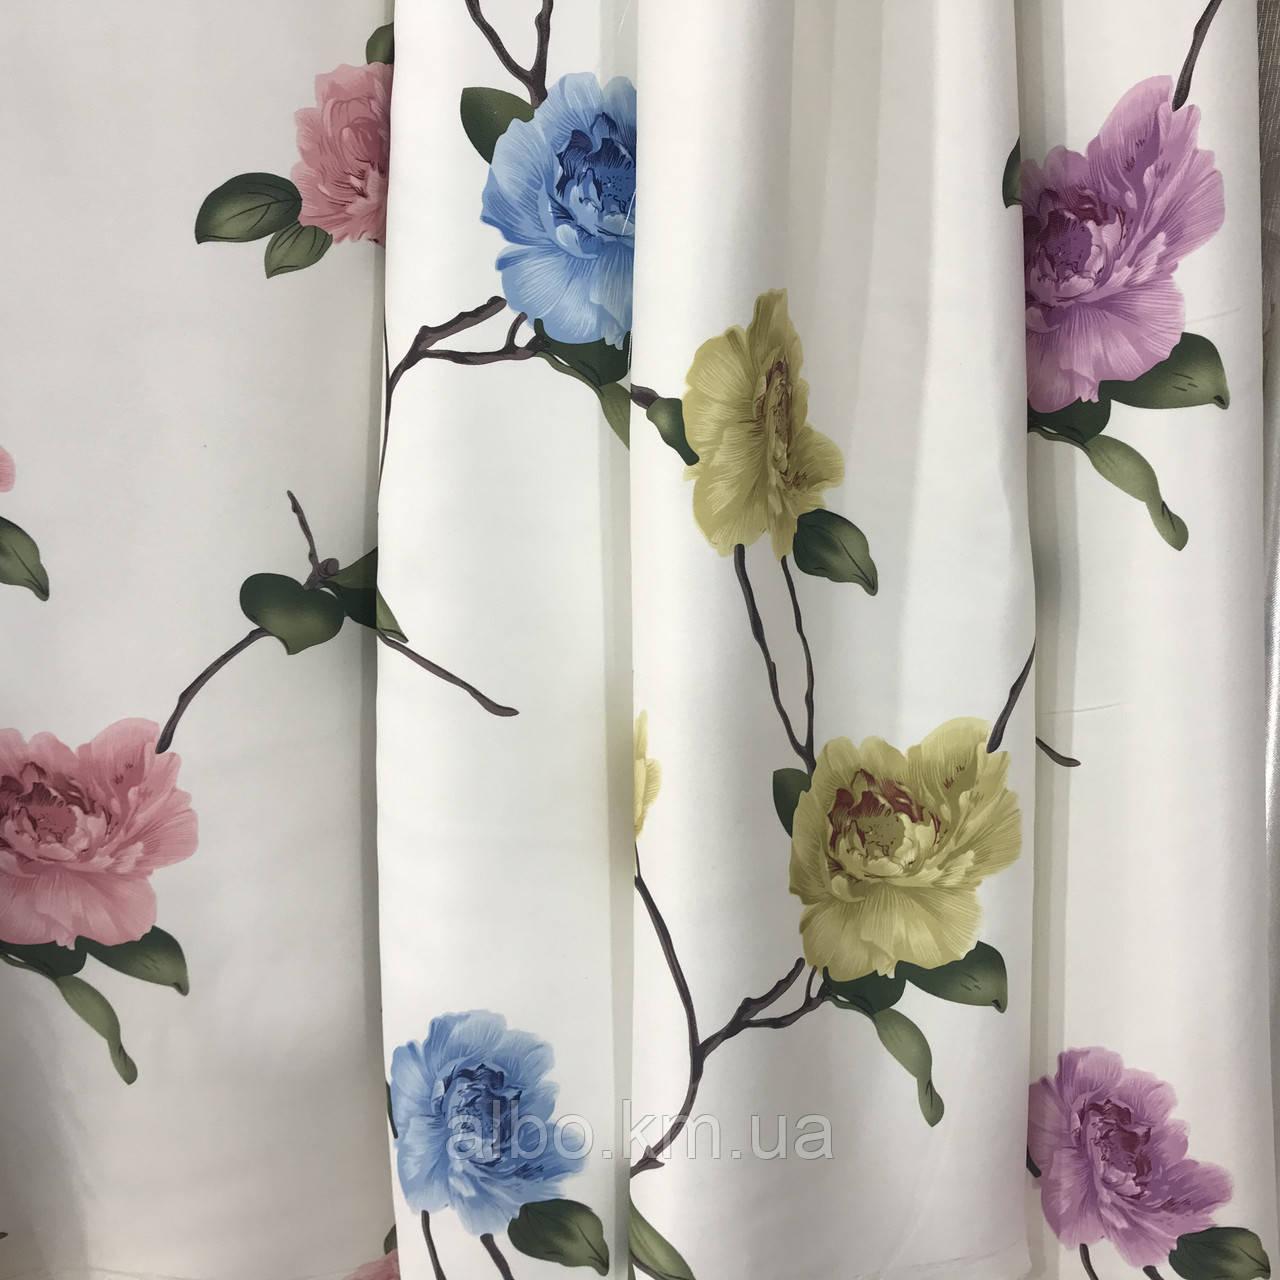 Шторная ткань с цветами, высота 2.8 м на метраж (614)